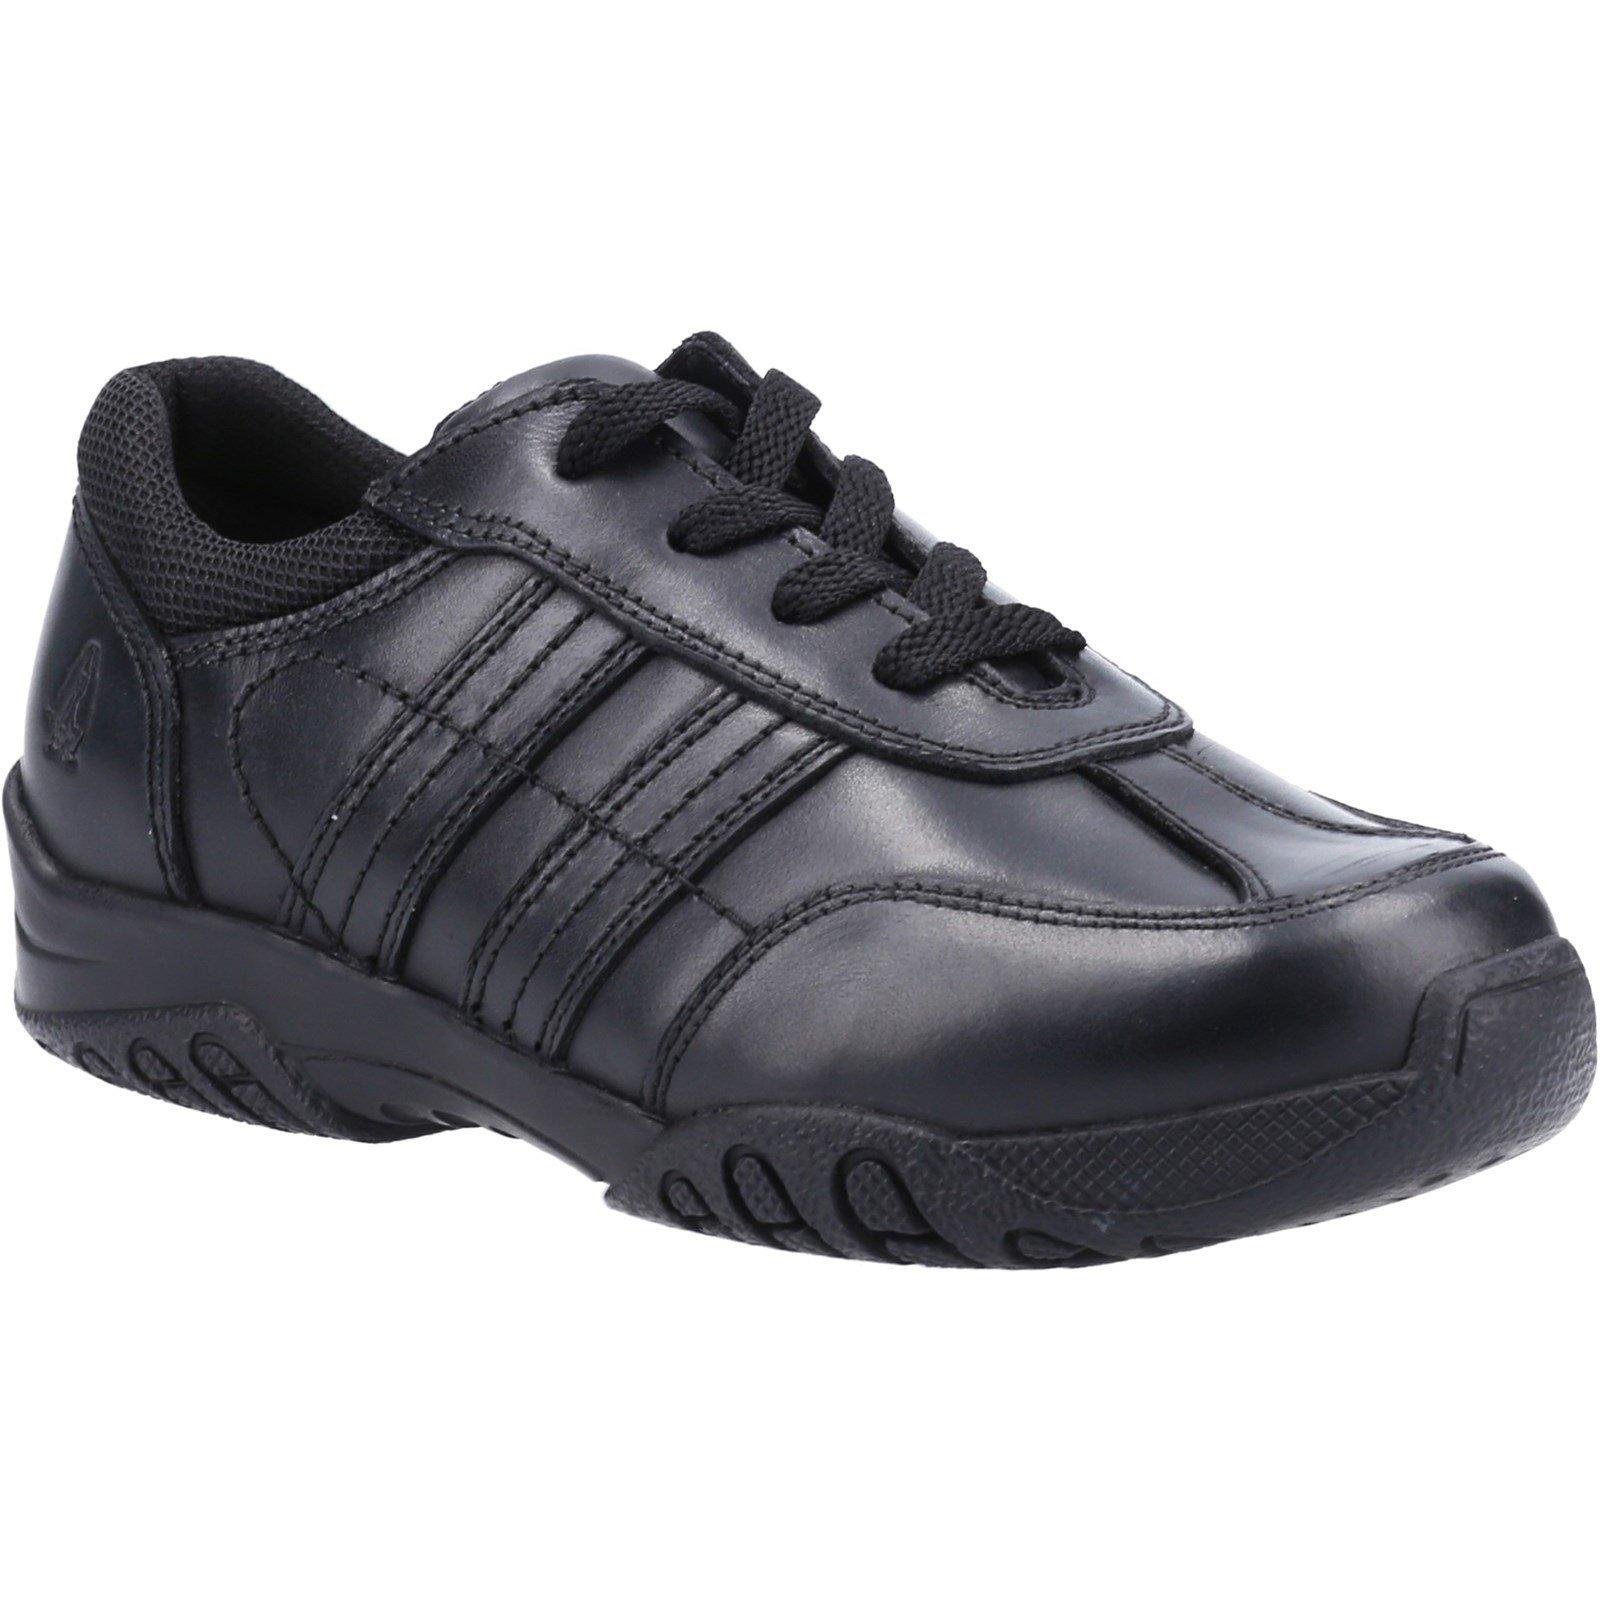 Hush Puppies Kid's Jezza2 Junior School Shoe Black 32606 - Black 1